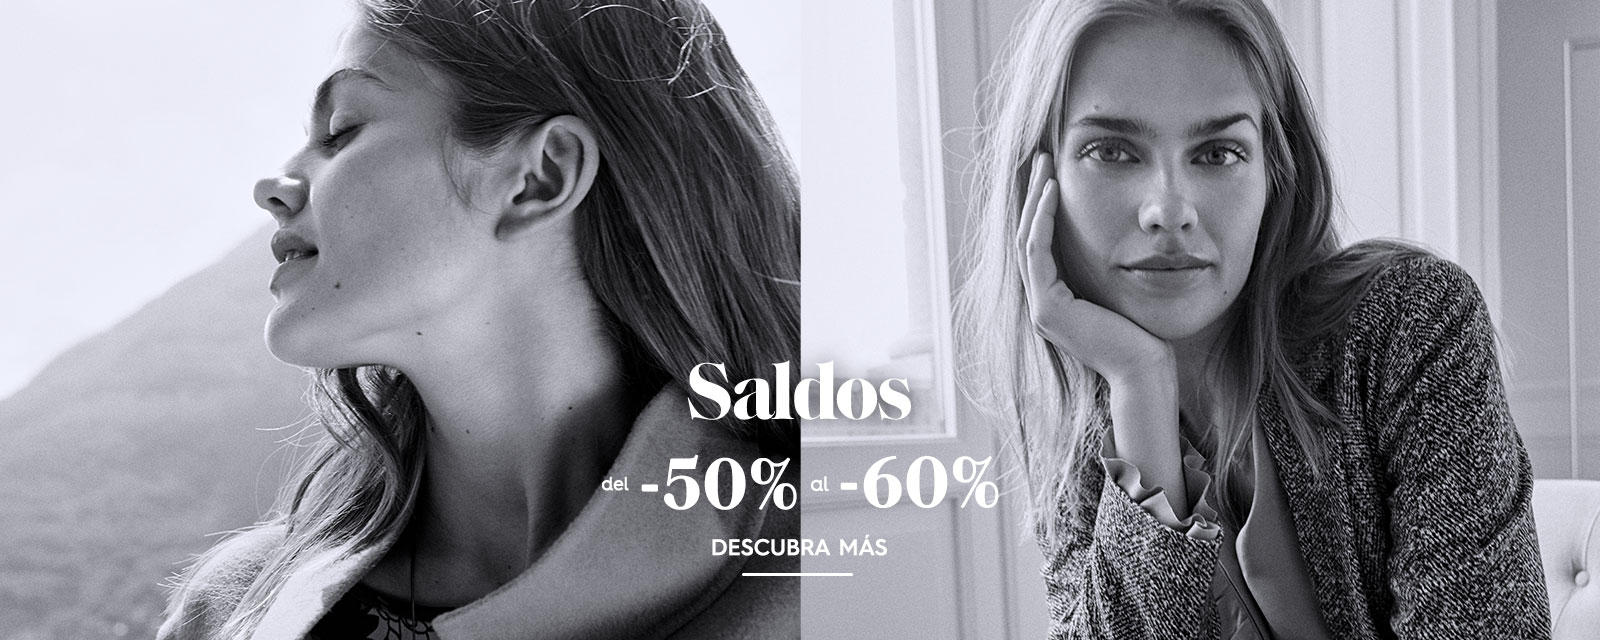 Saldos Elena Mirò: del -50% al -60%